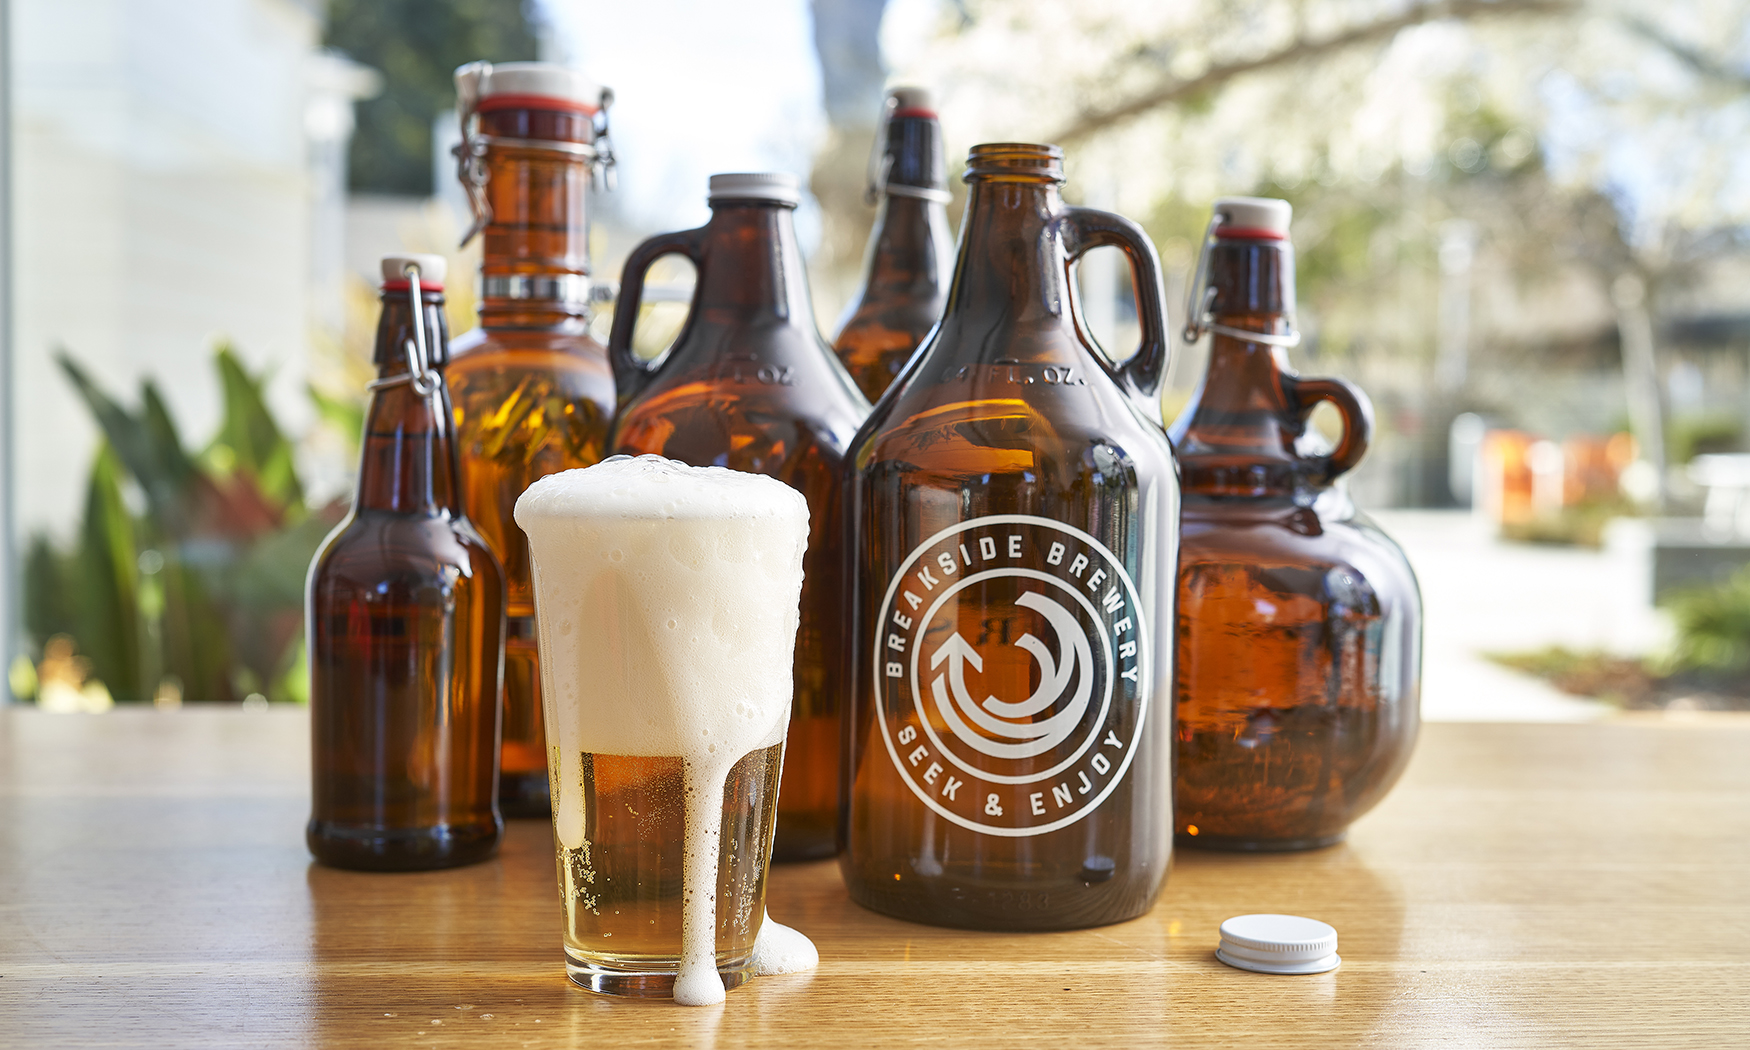 Explore Portland: 8 Must-Visit Portland Breweries